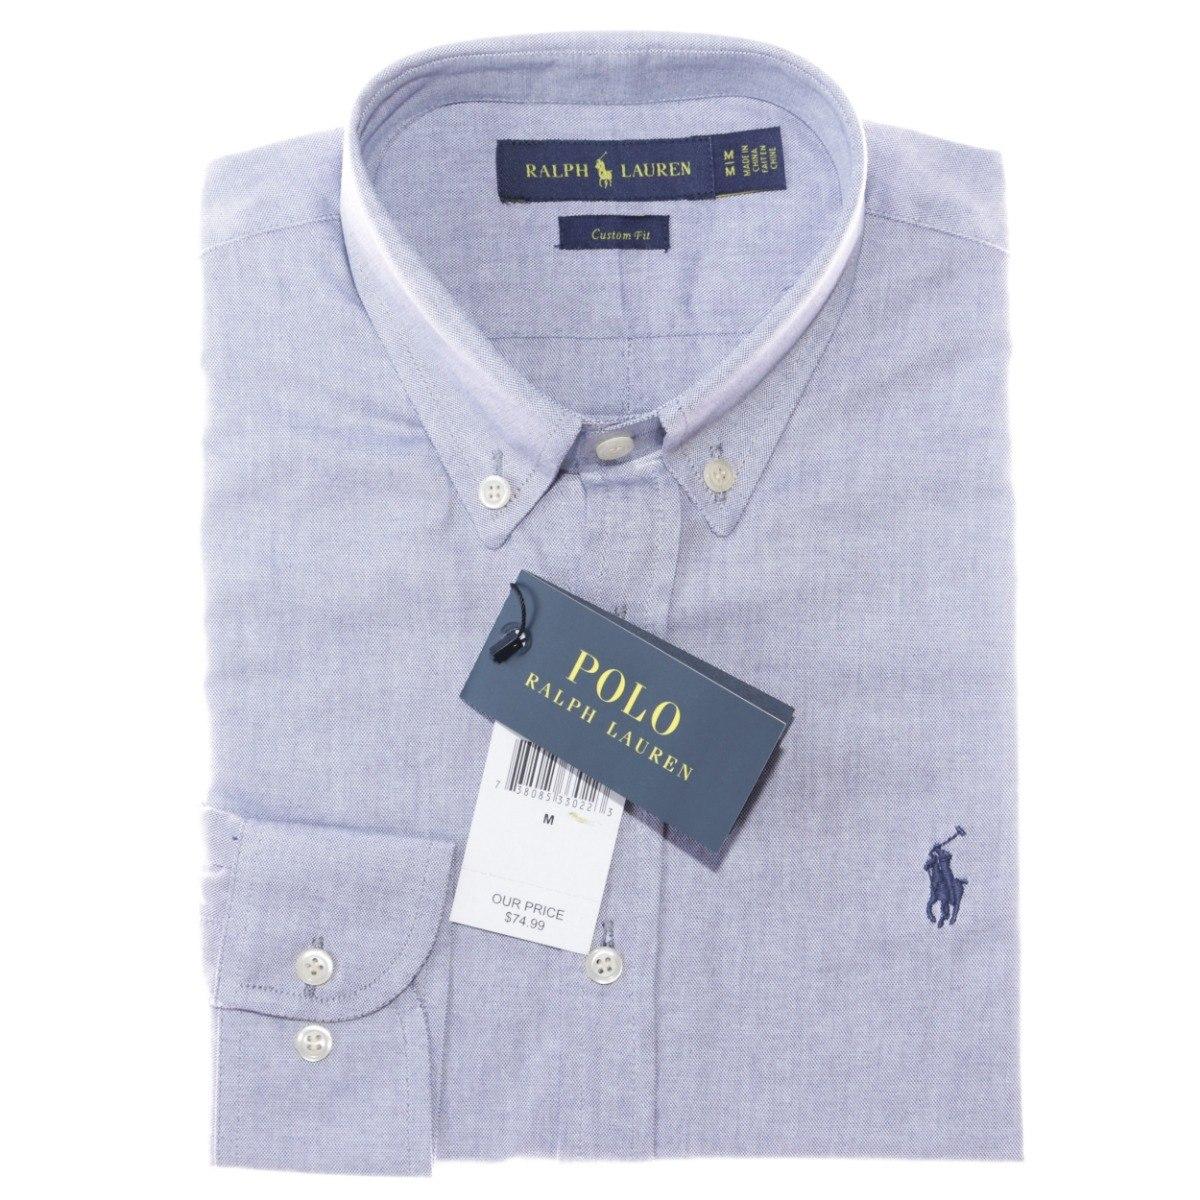 d20dbaeb55a50 camisa social ralph lauren oxford azul acinzentado original. Carregando  zoom.